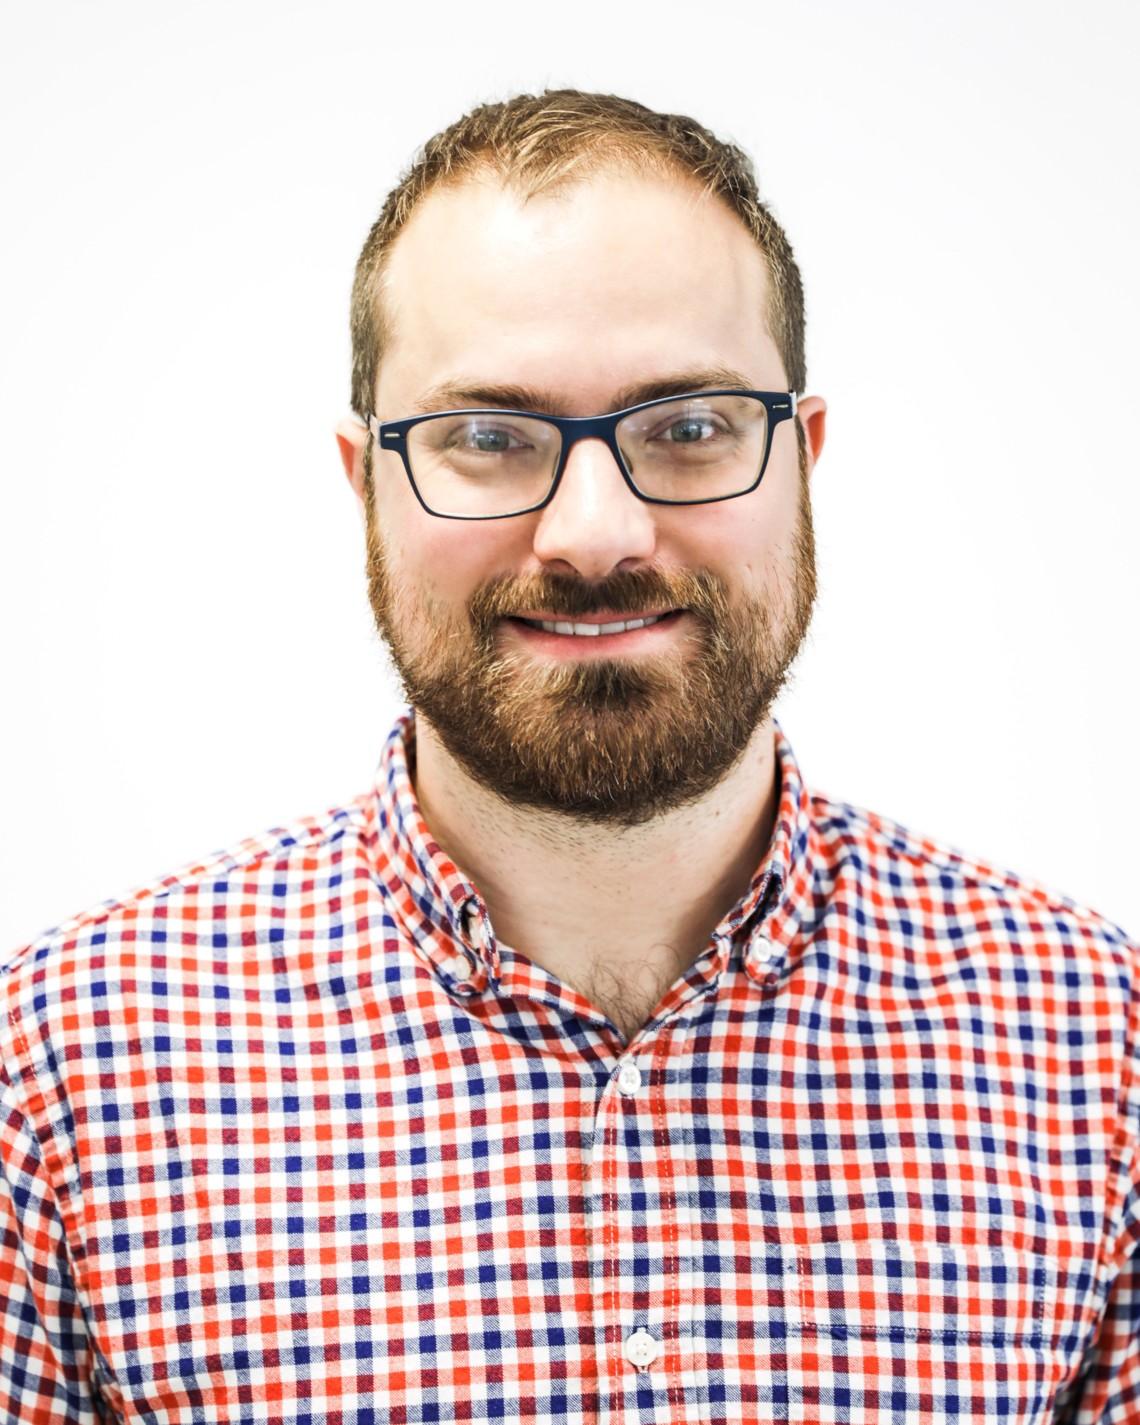 Erik Oster